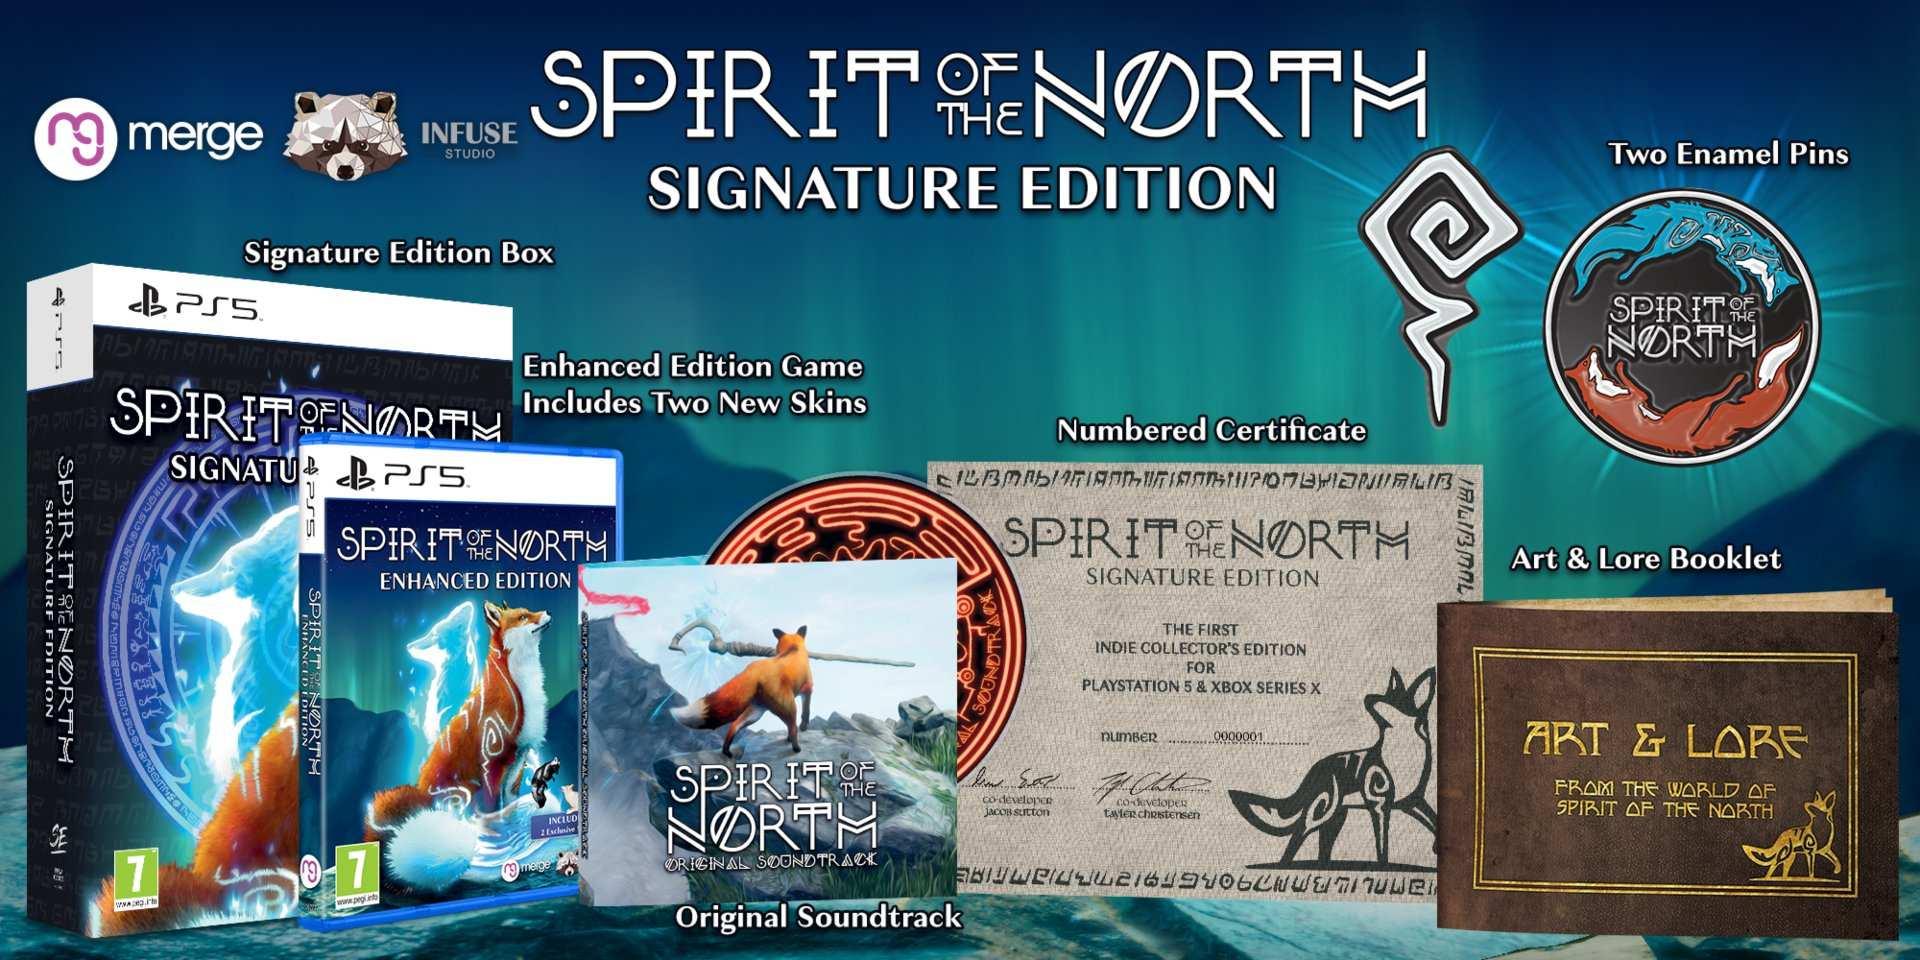 Signature Edition